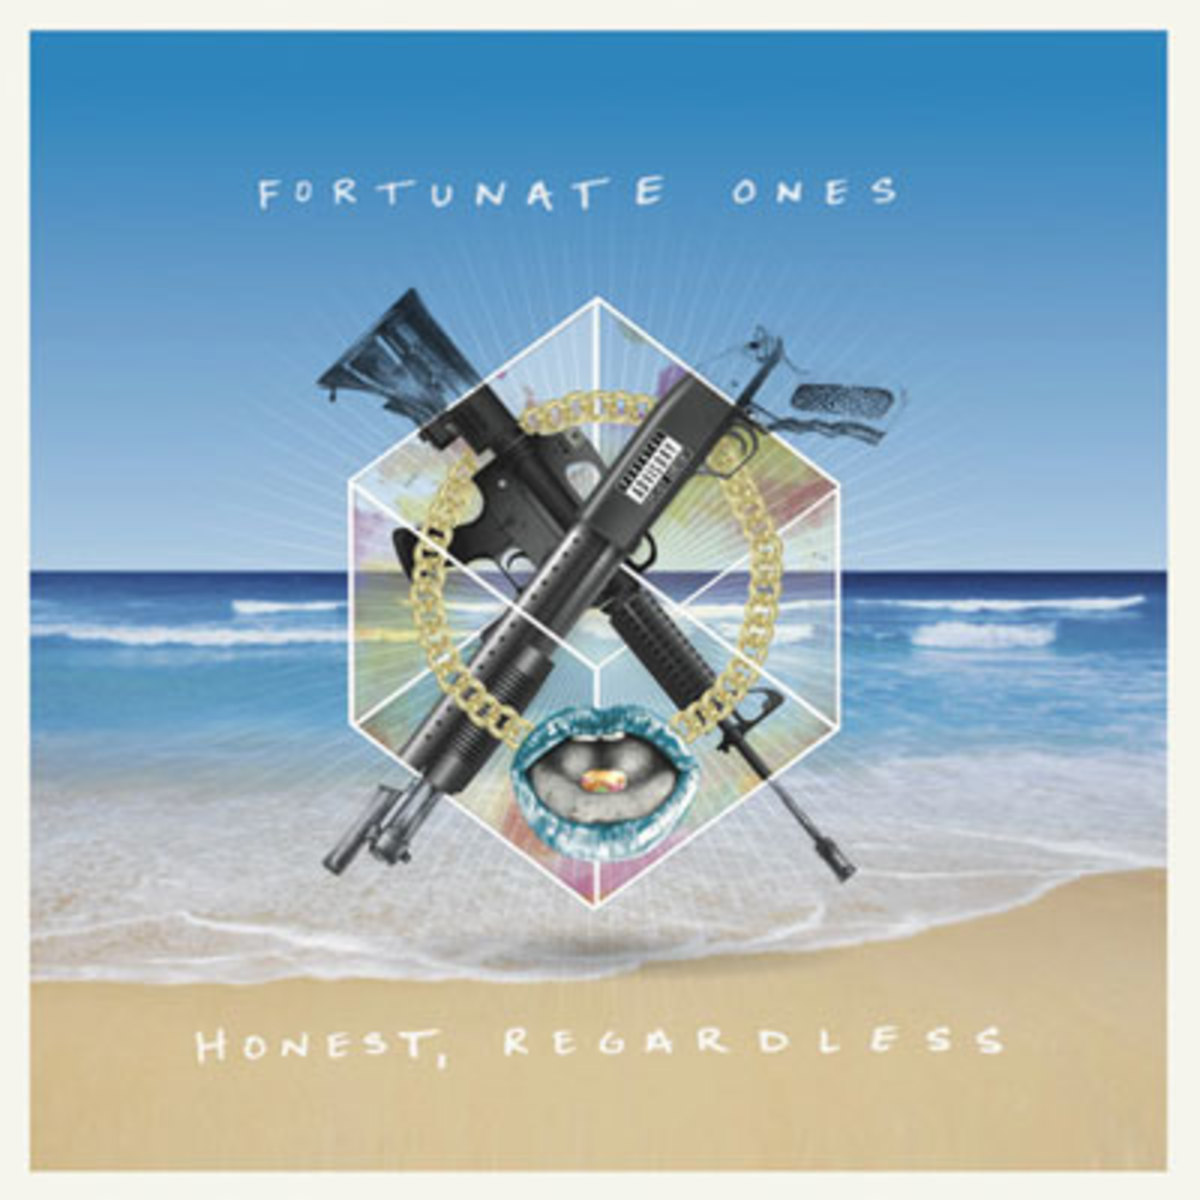 fortunateones-honestregardless.jpg